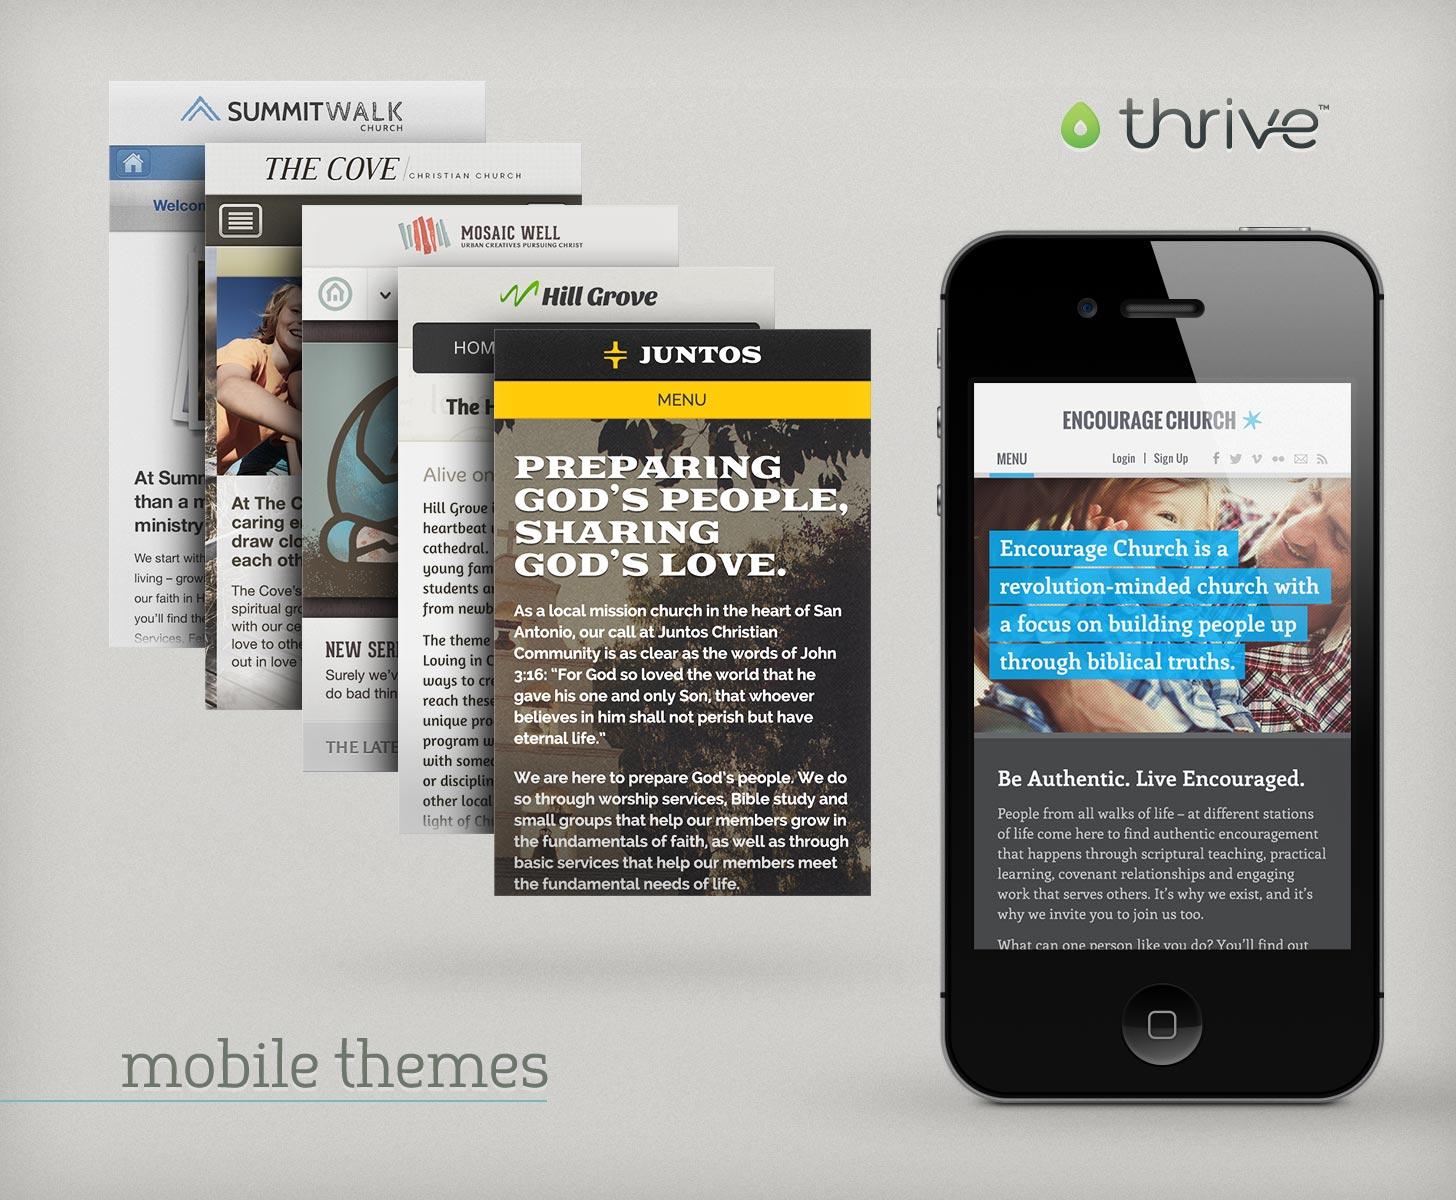 Thrive mobile themes